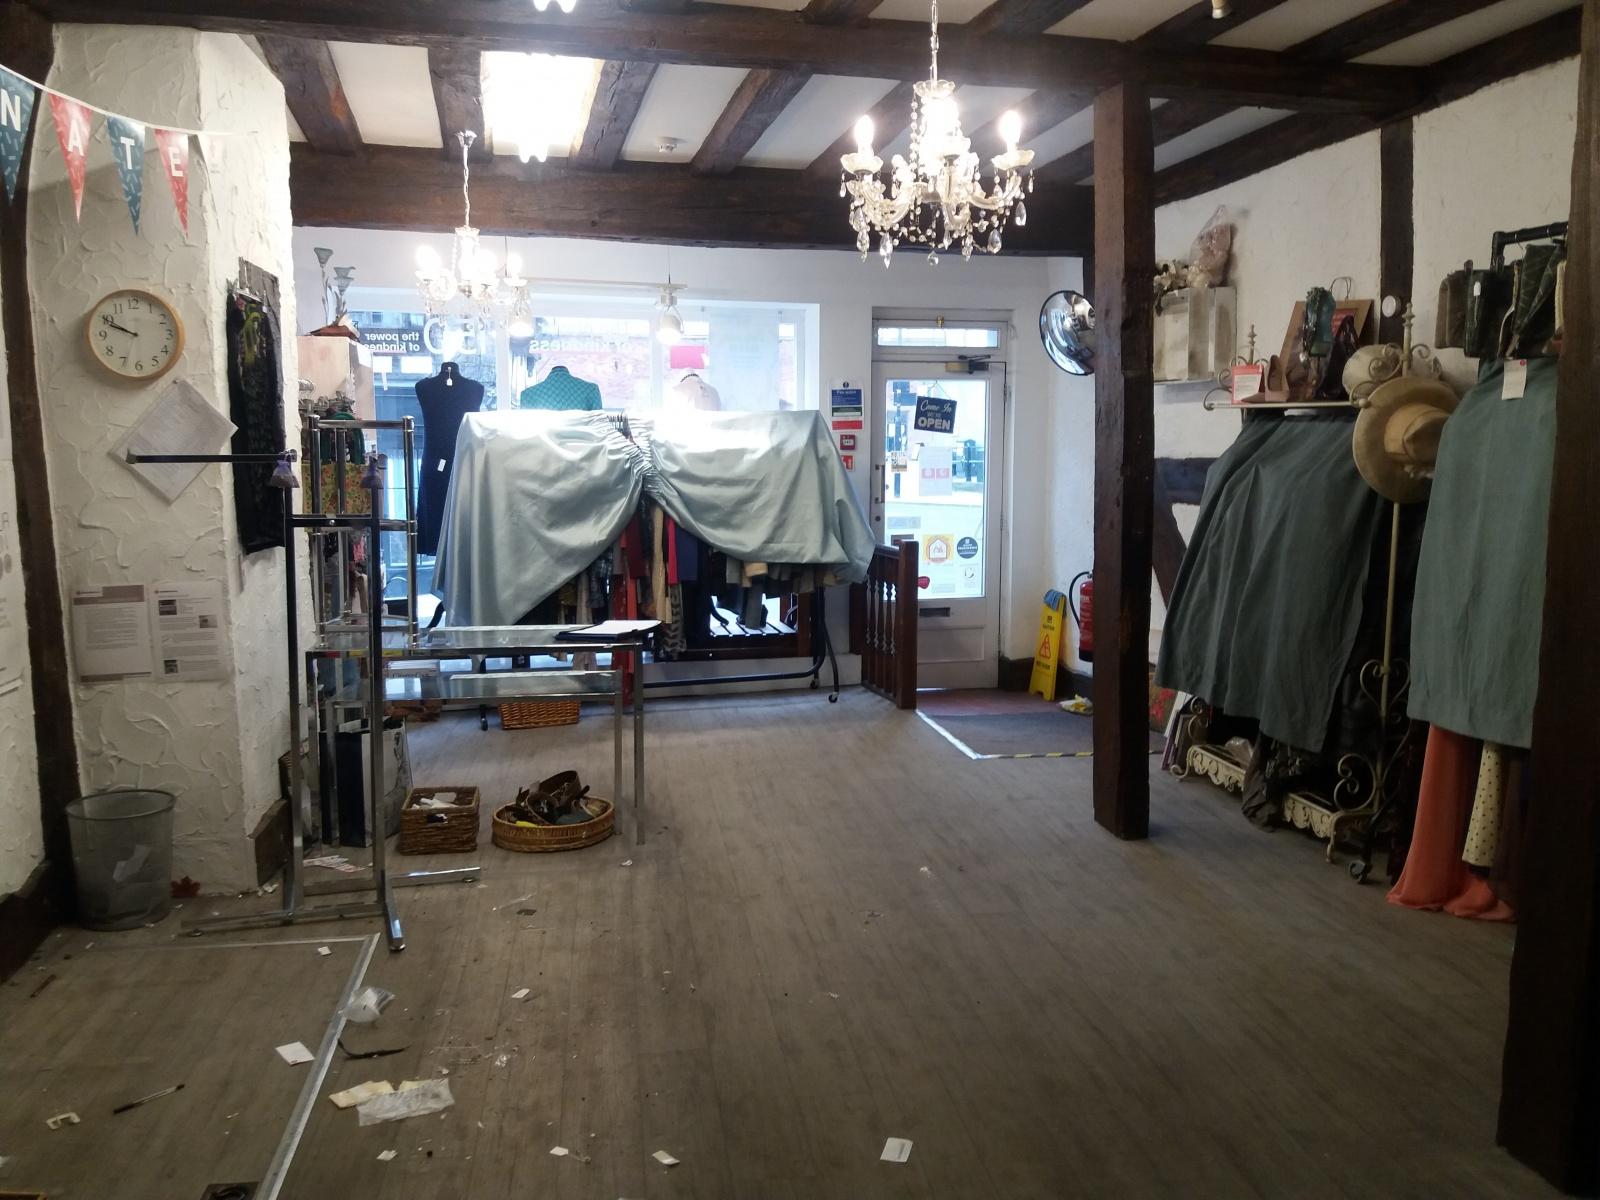 14 Mardol, Shrewsbury, Shropshire